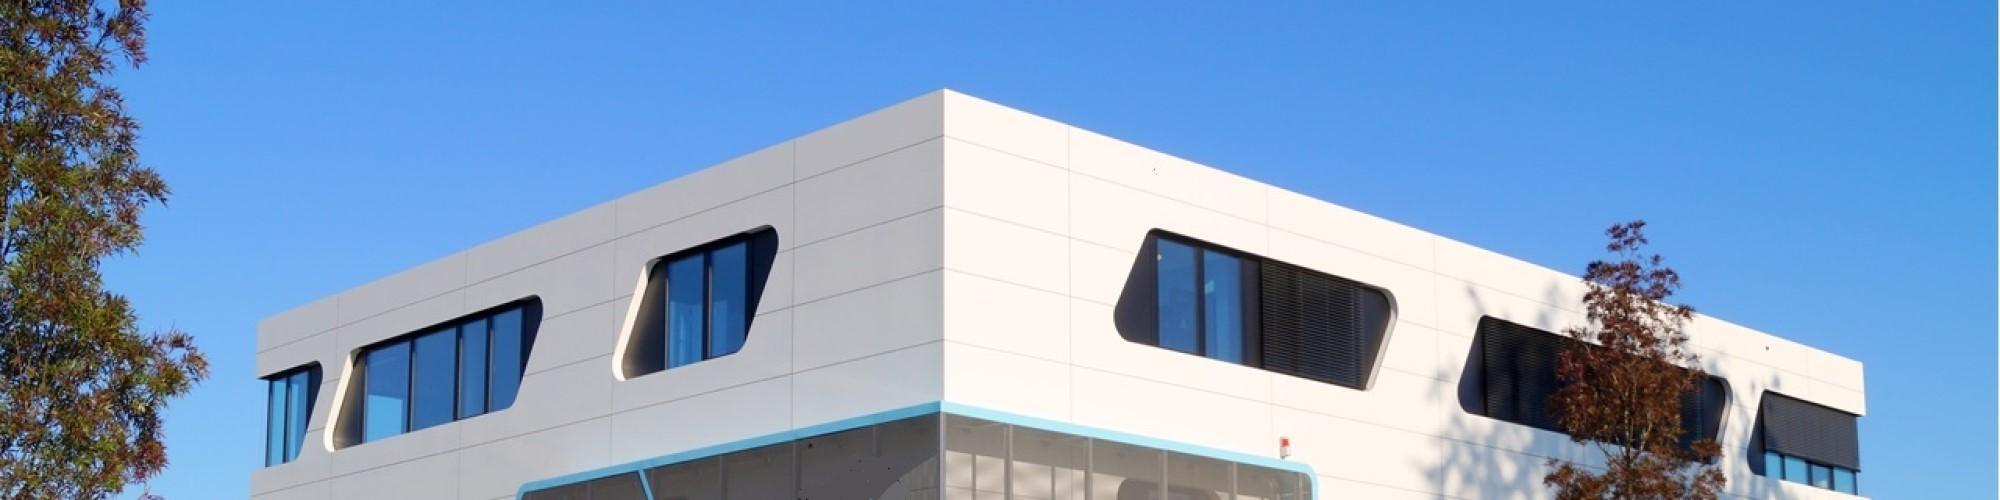 Netz16 GmbH